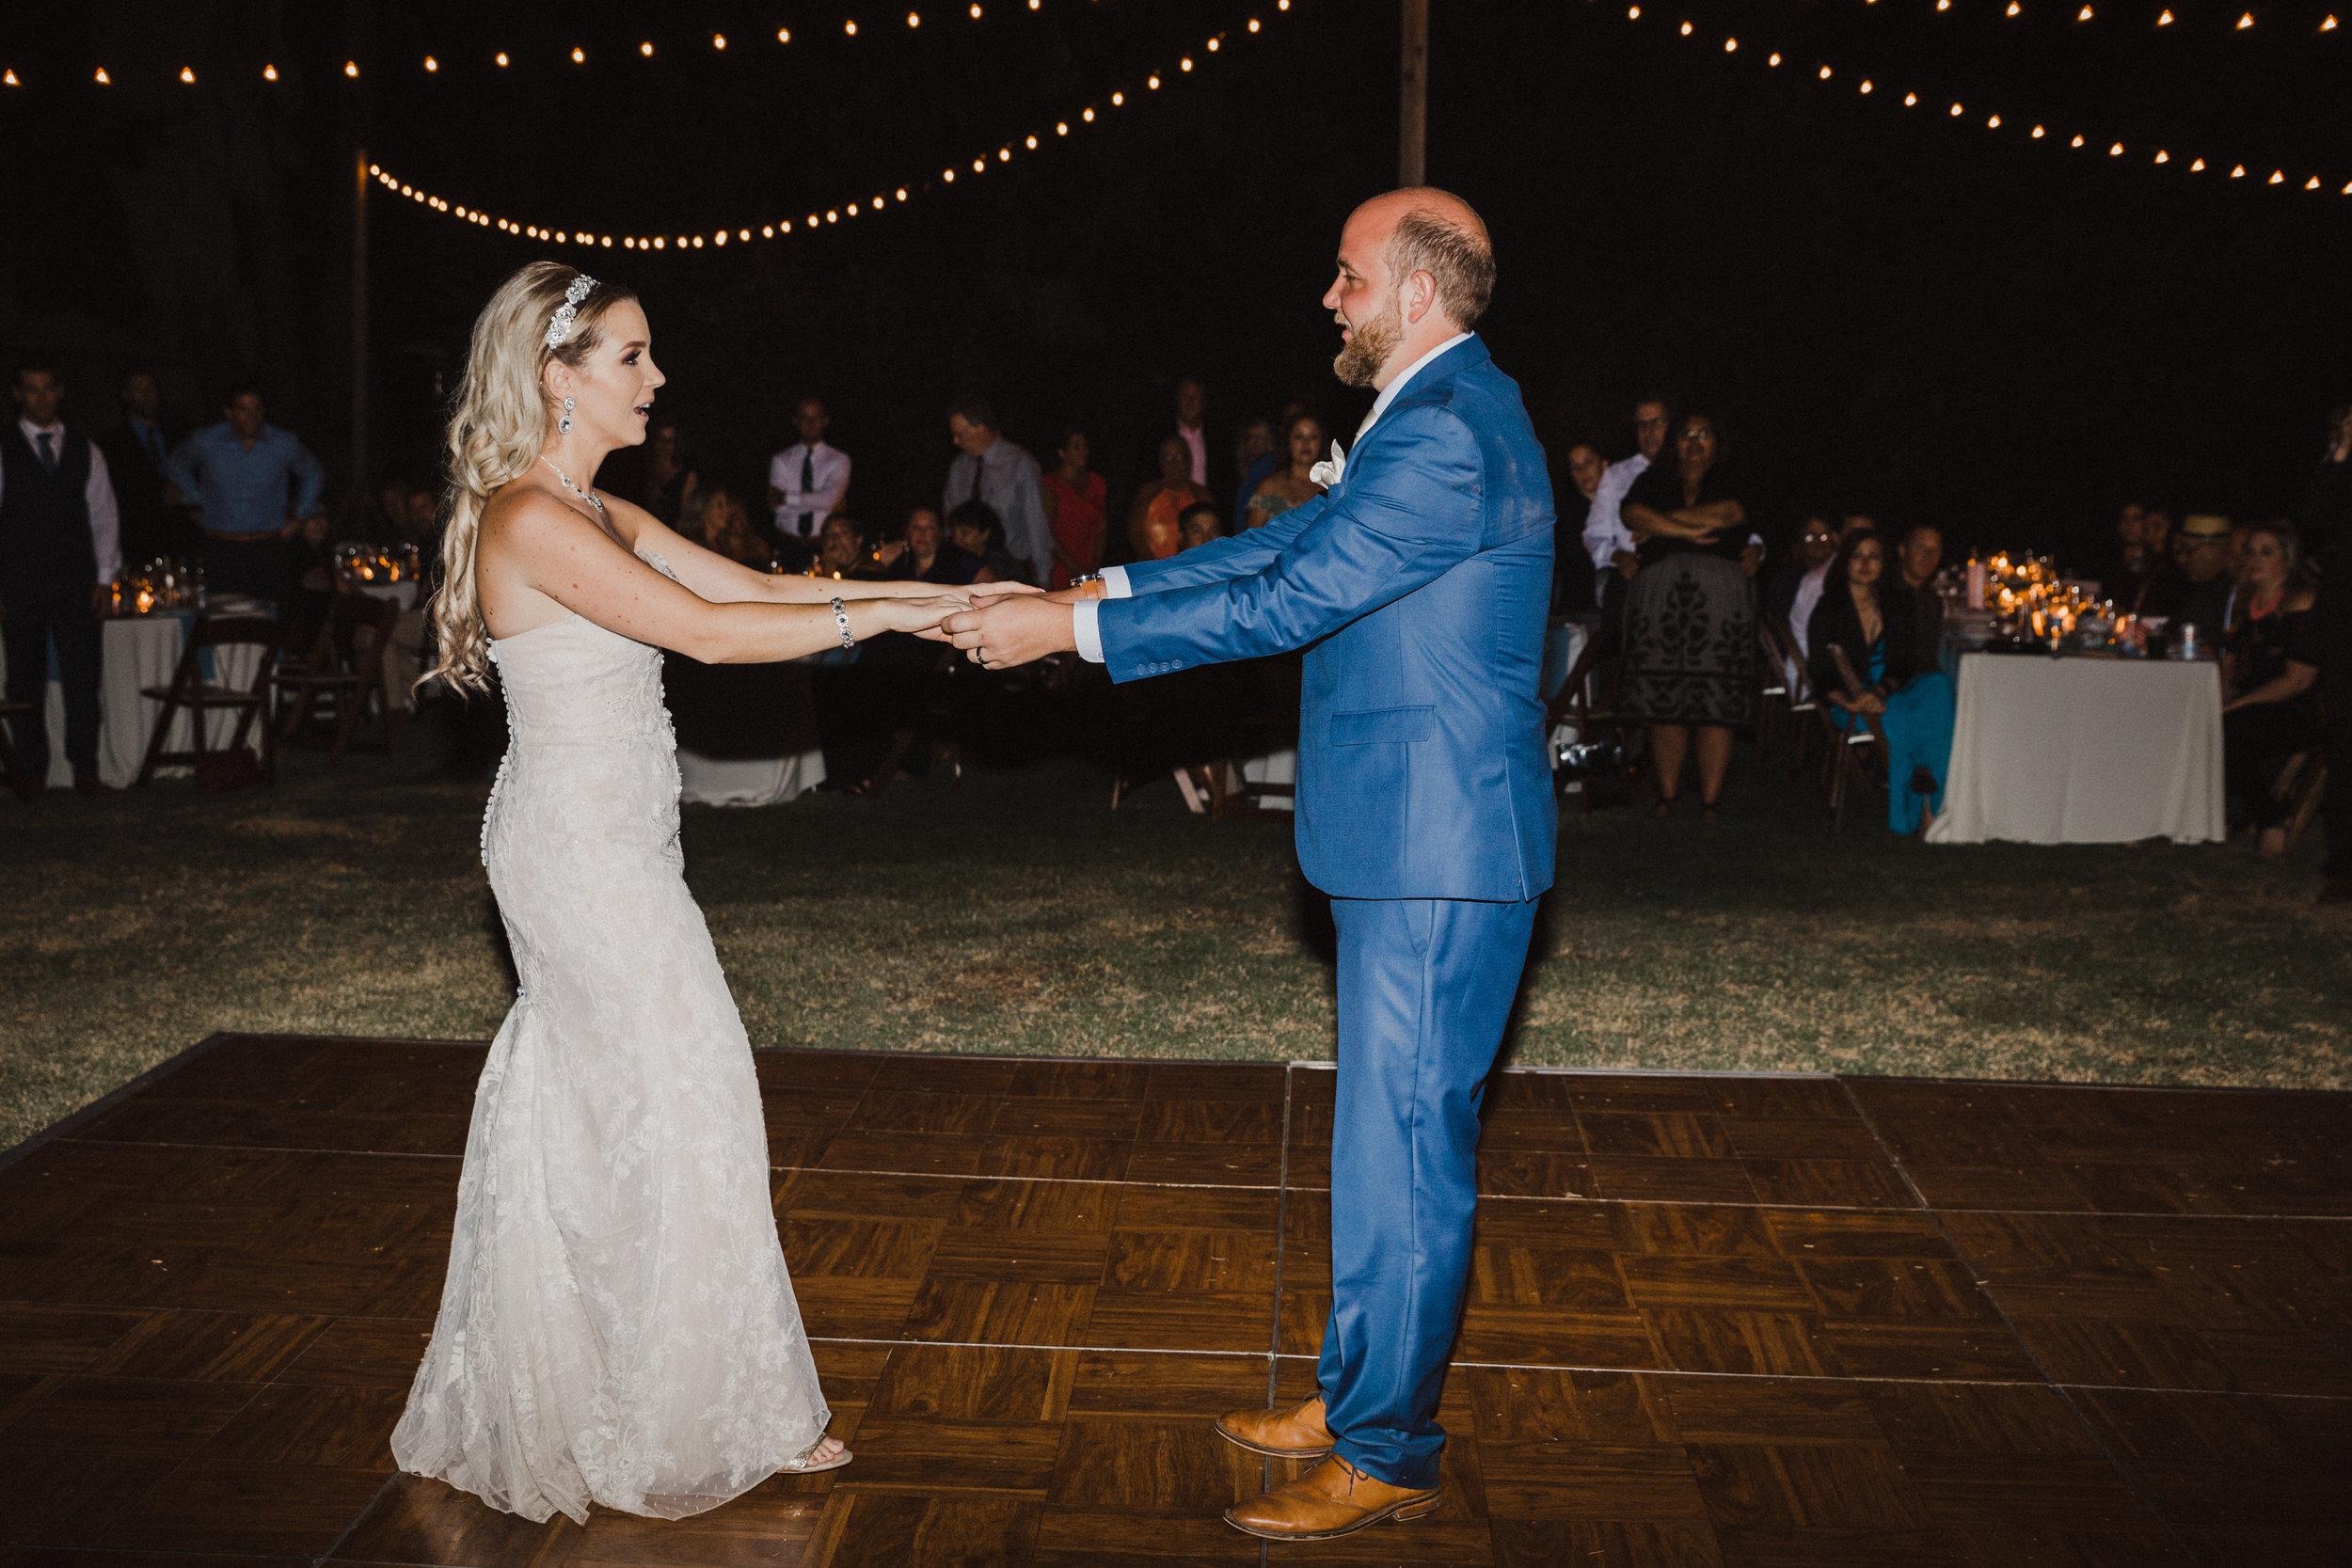 DianaLakePhoto-L+M-San-Diego-Wedding-Reception23.jpg